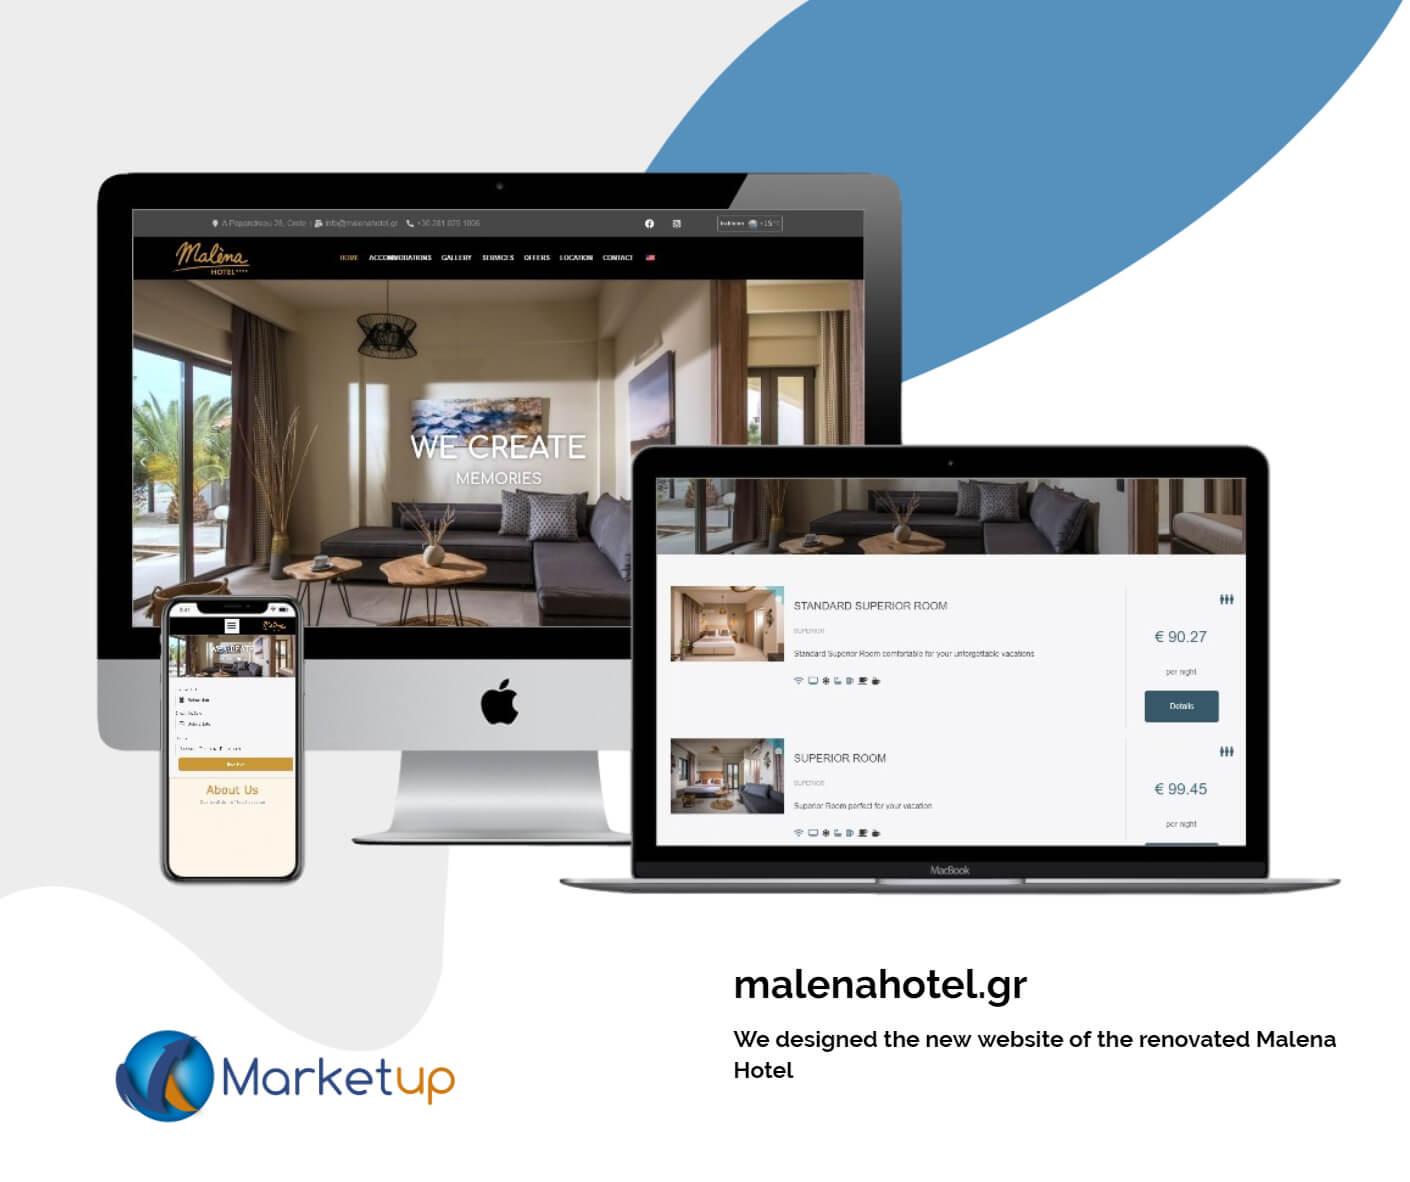 hotel SEO-marketup